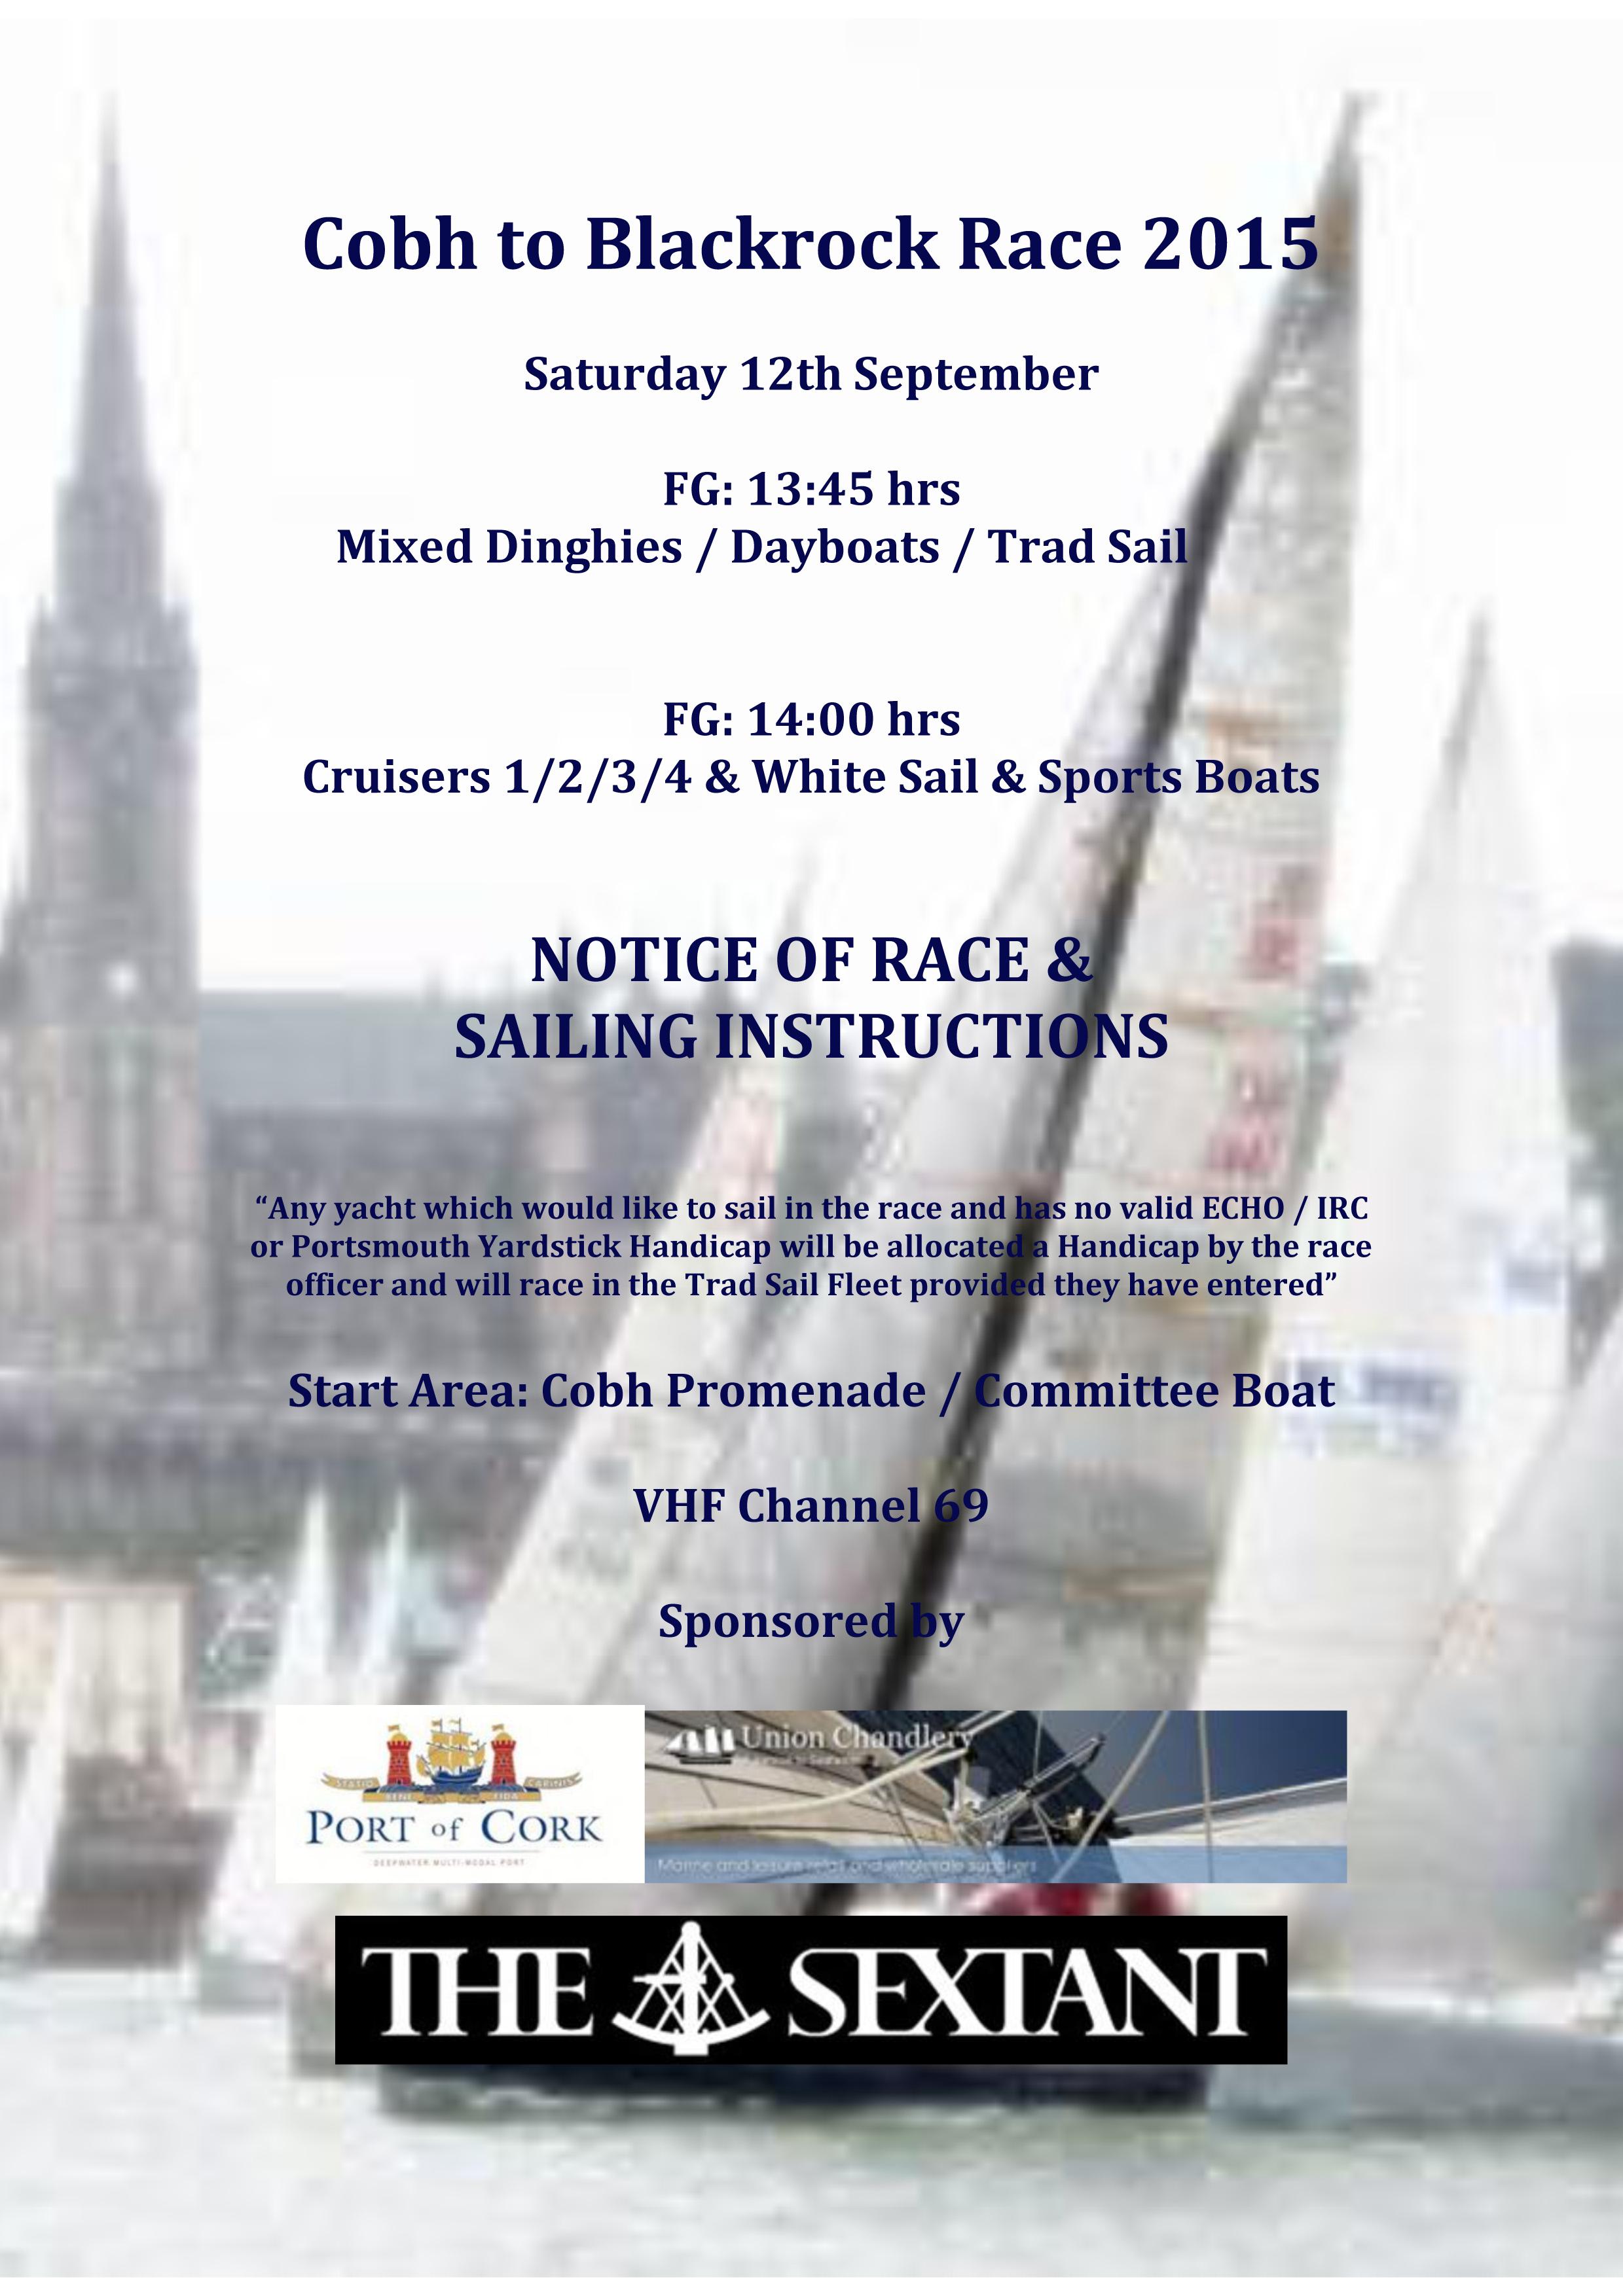 C2B Race 2015 NOR